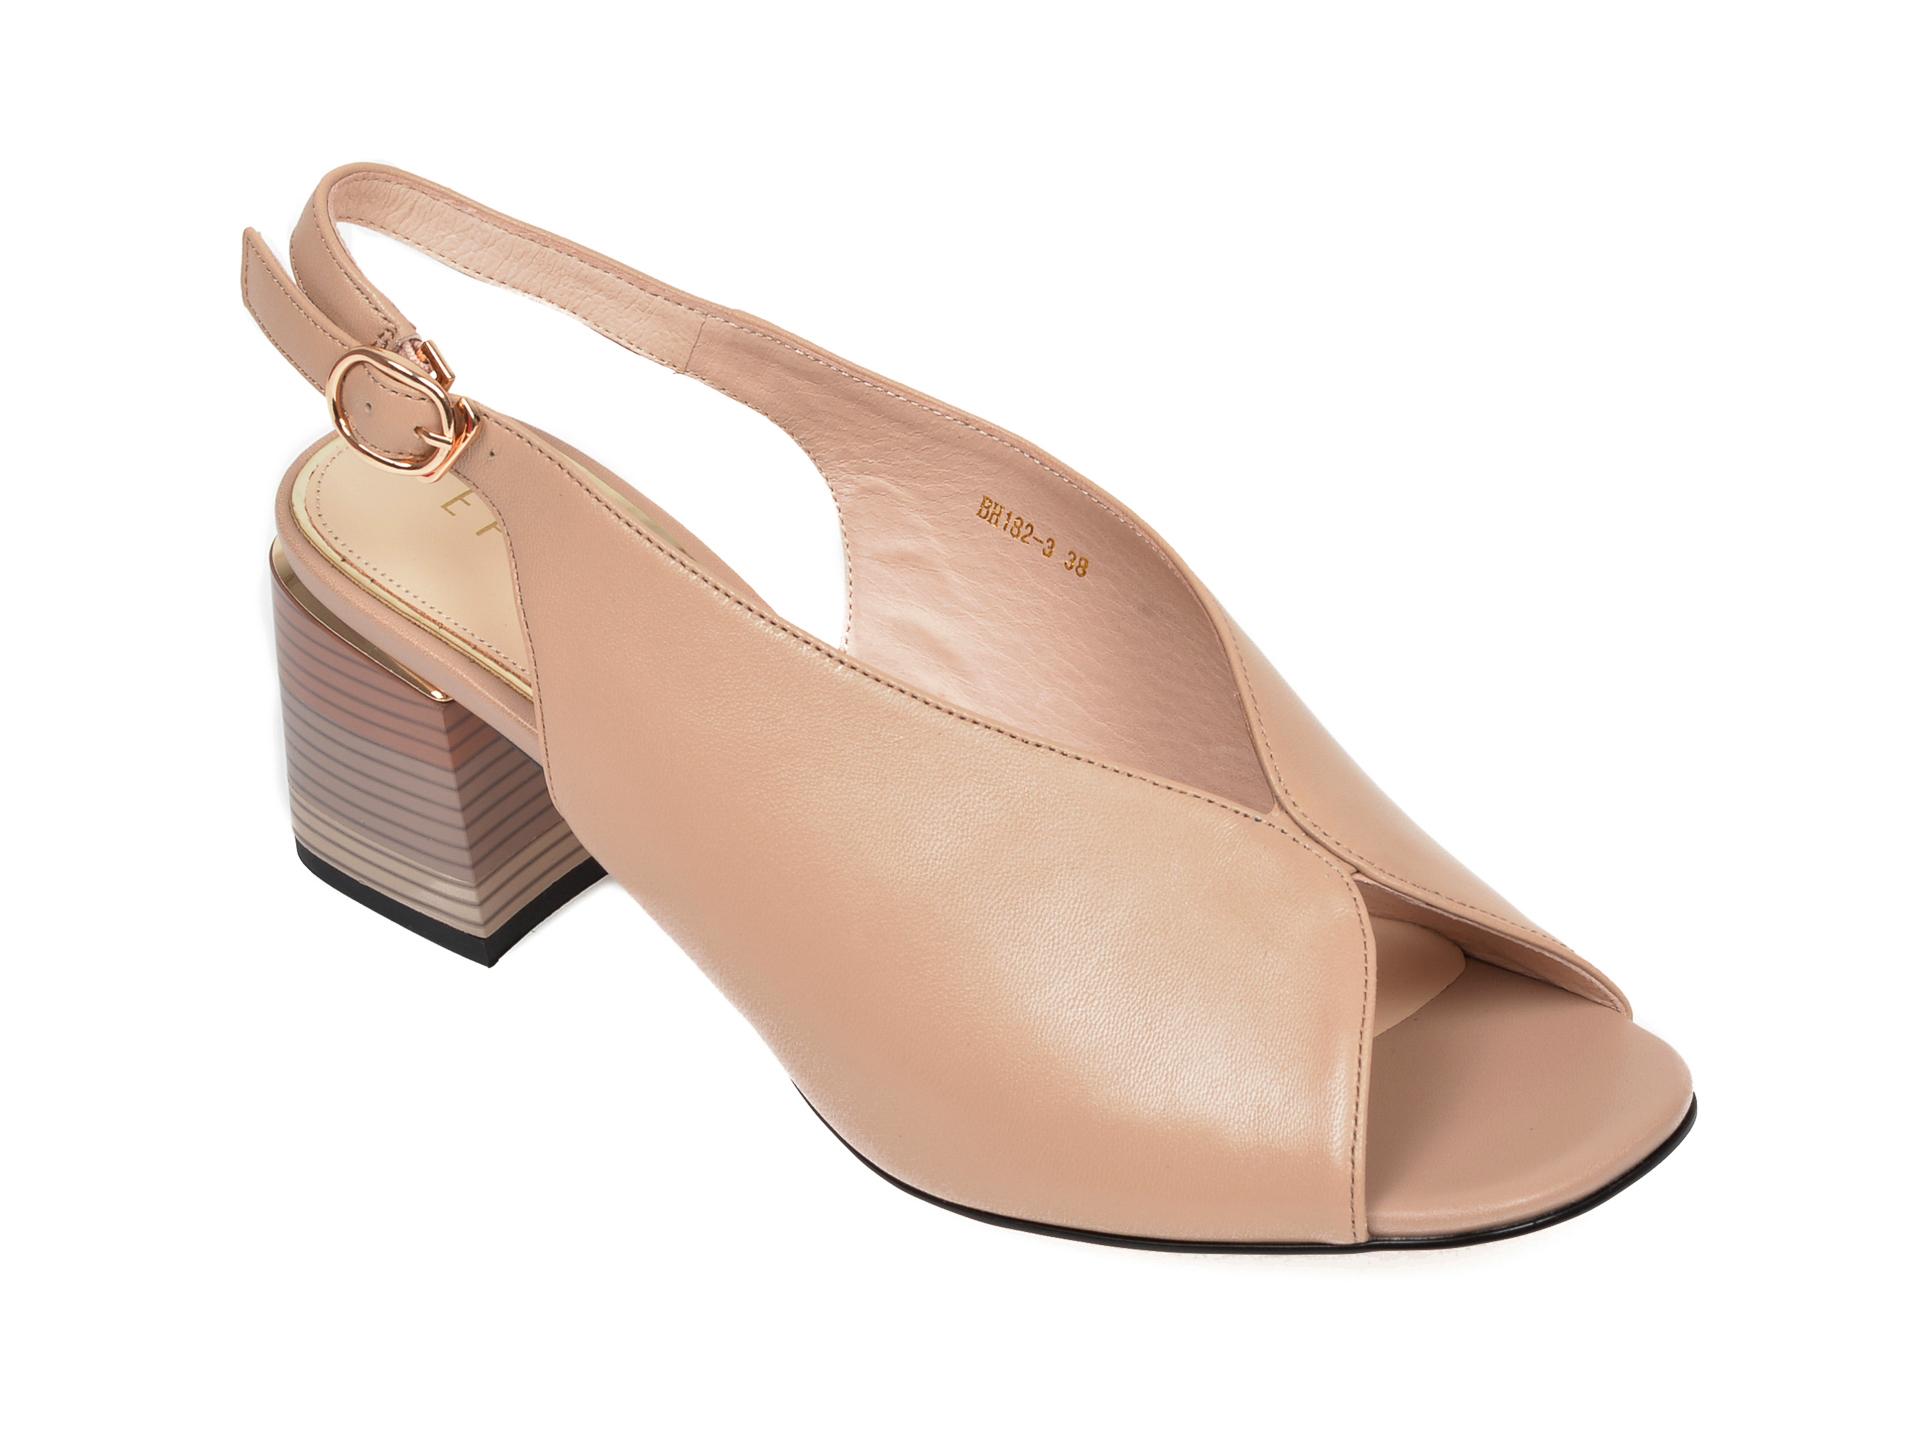 Sandale EPICA bej, BH182, din piele naturala New